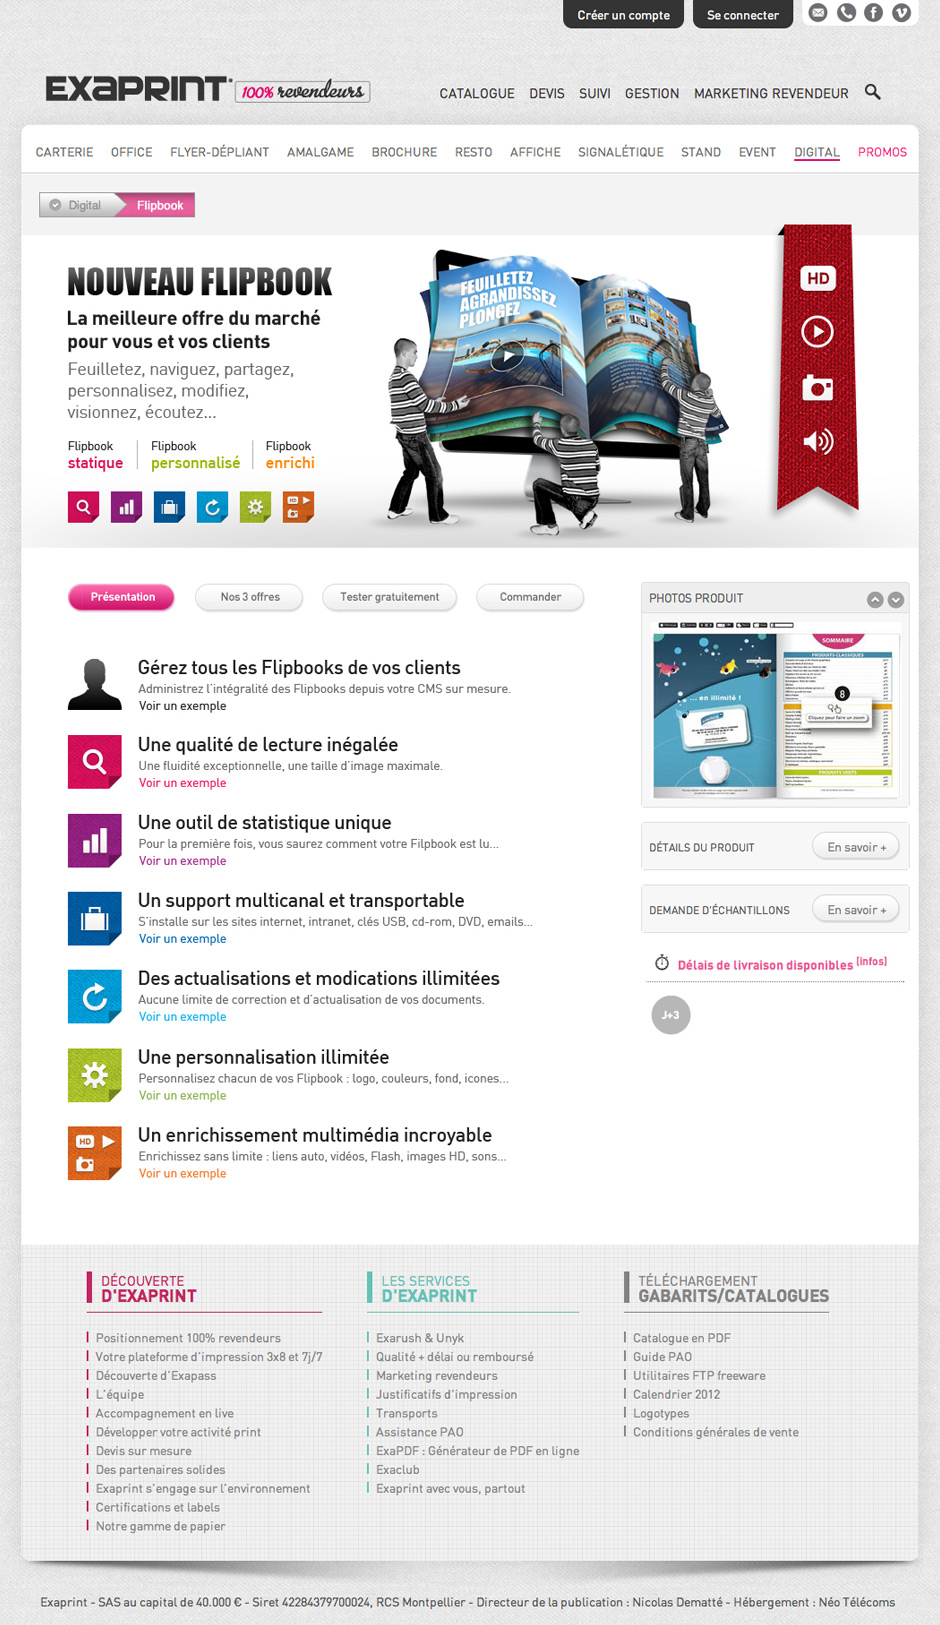 graphiste-montpellier-creation-exaprint-flipbook-agence-communication-montpellier-caconcept-alexis-cretin-4